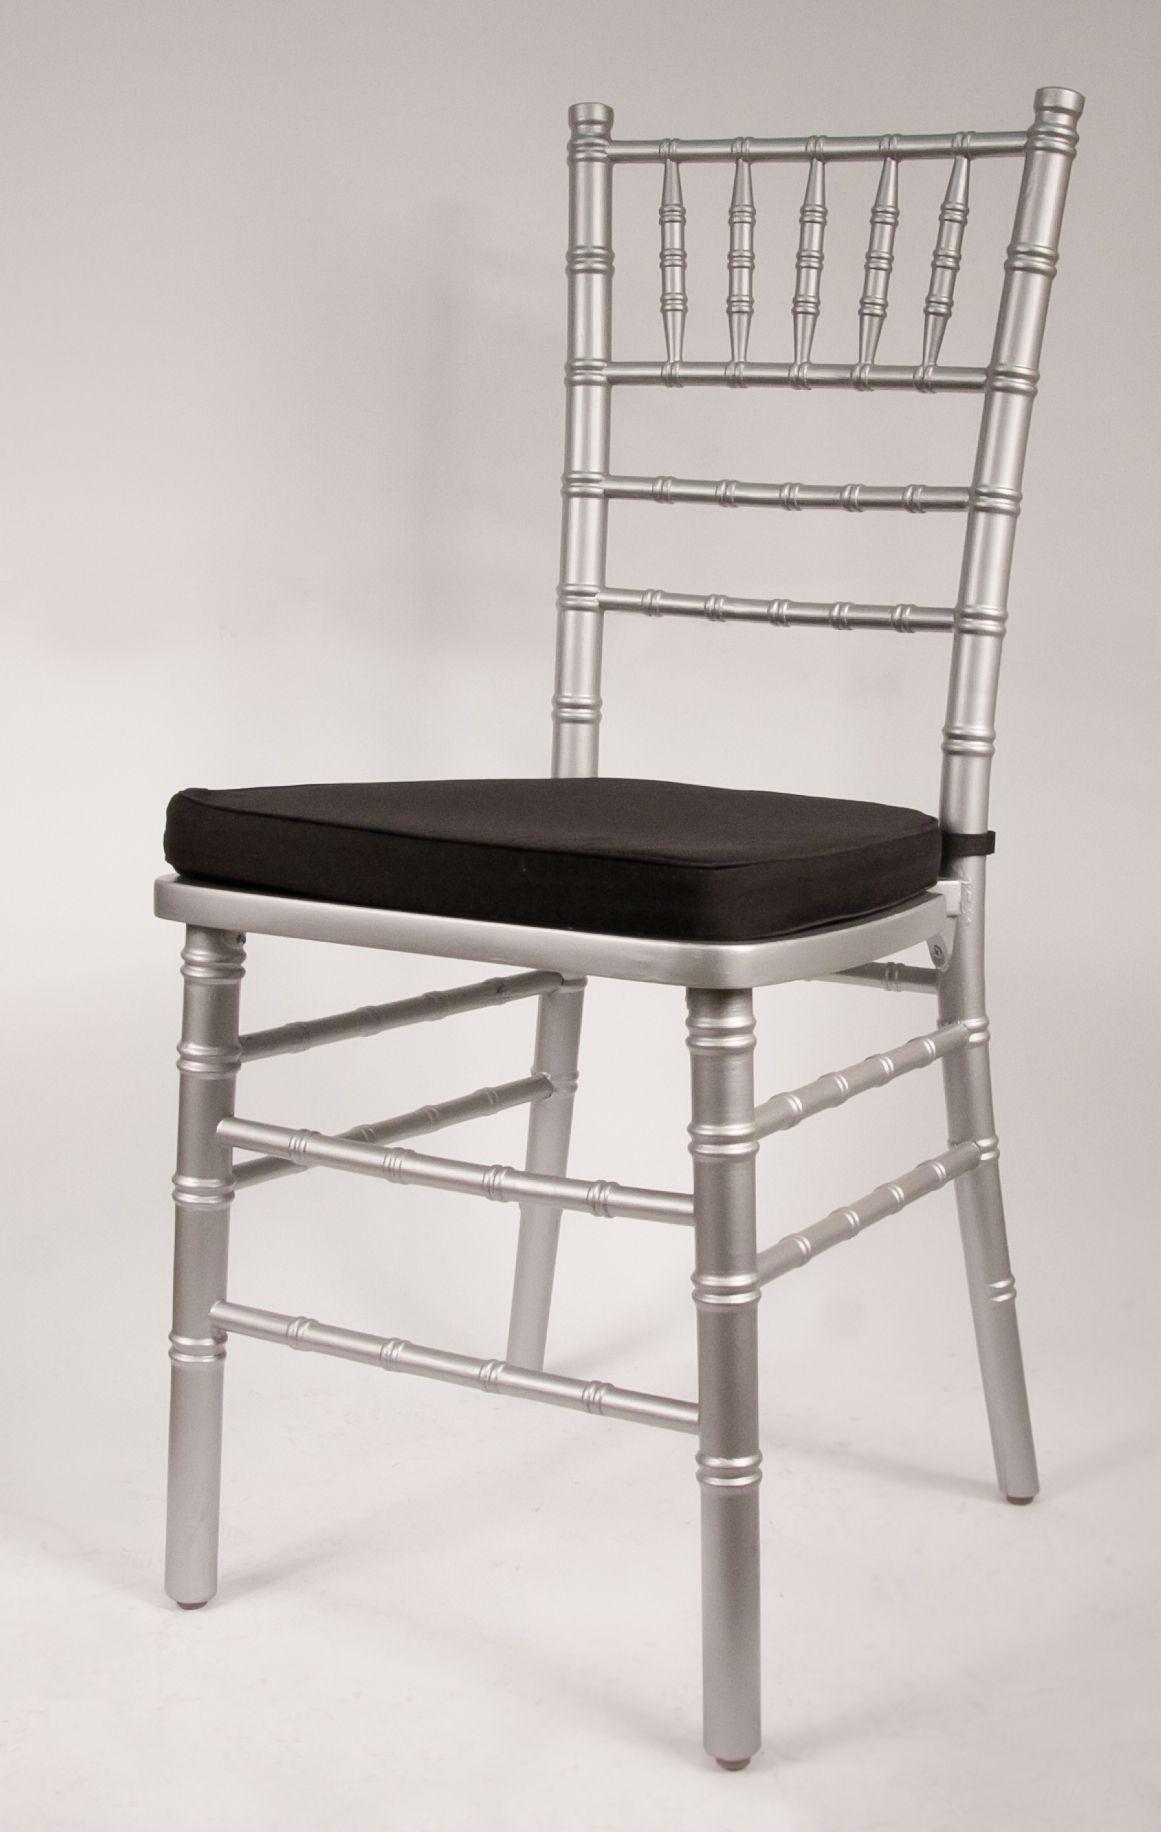 Silver Chiavari Chair Frame By Vision Furniture Featuring